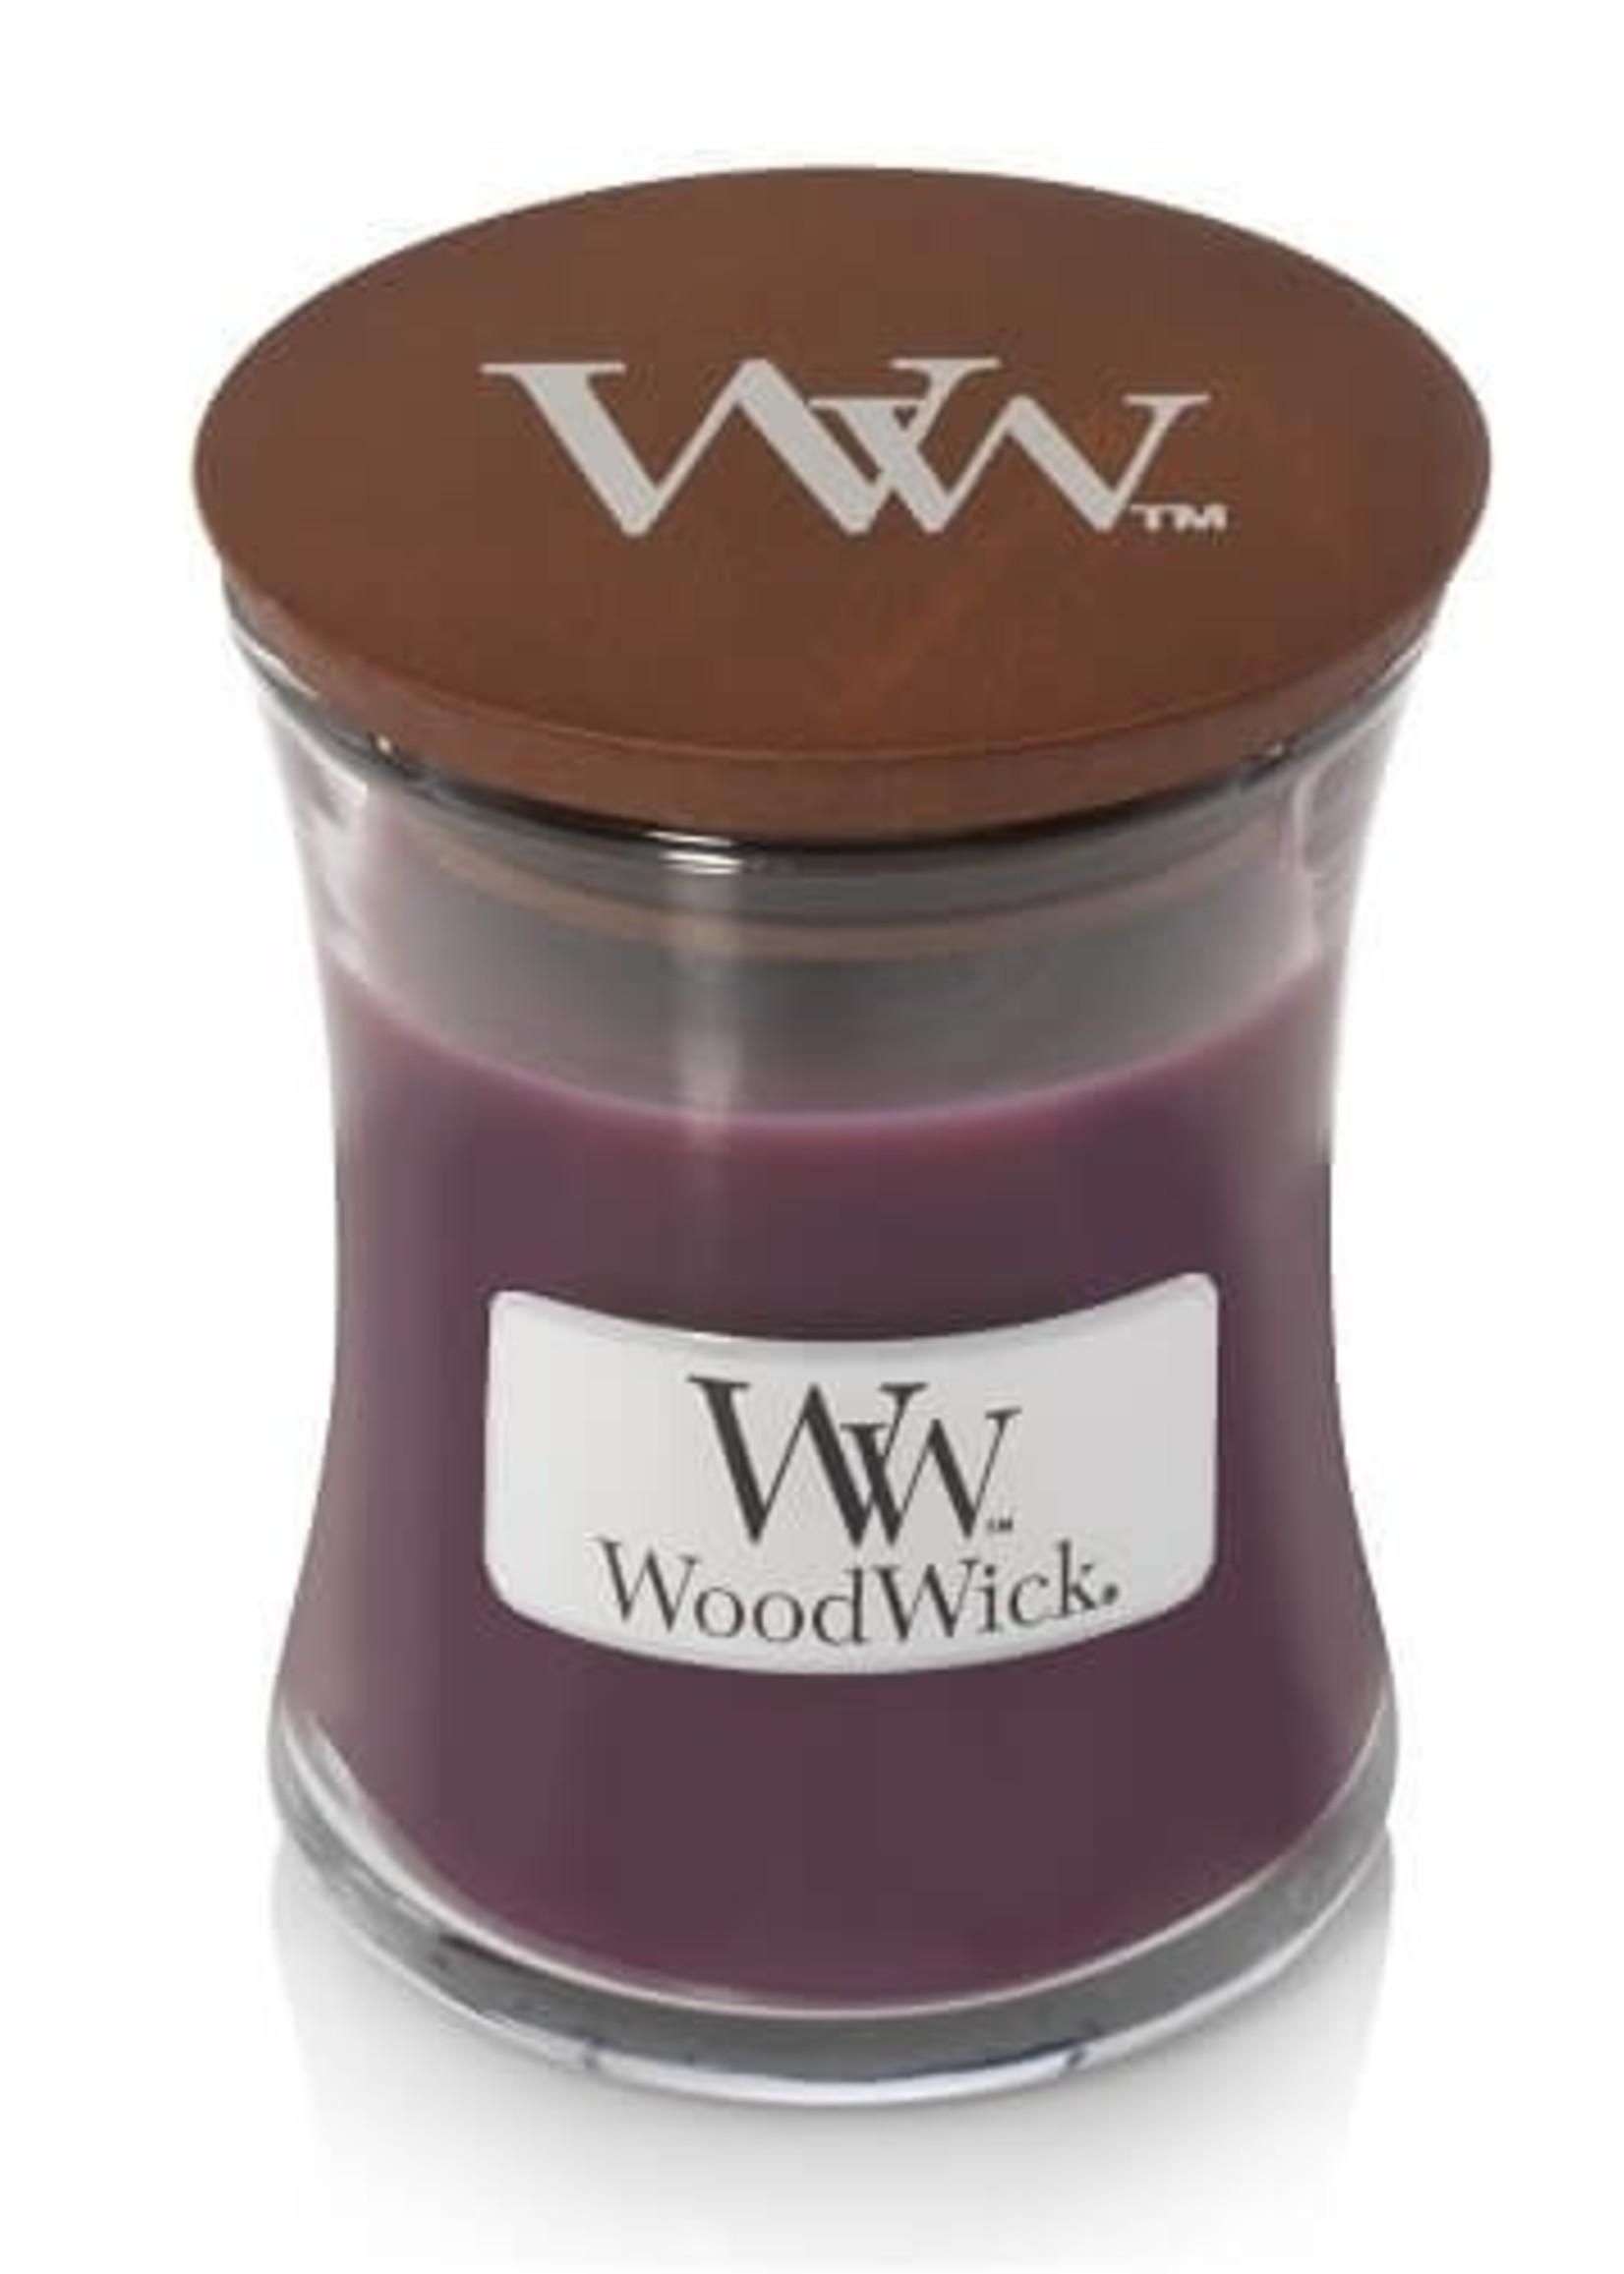 Woodwick Woodwick Dark Poppy Mini Candle